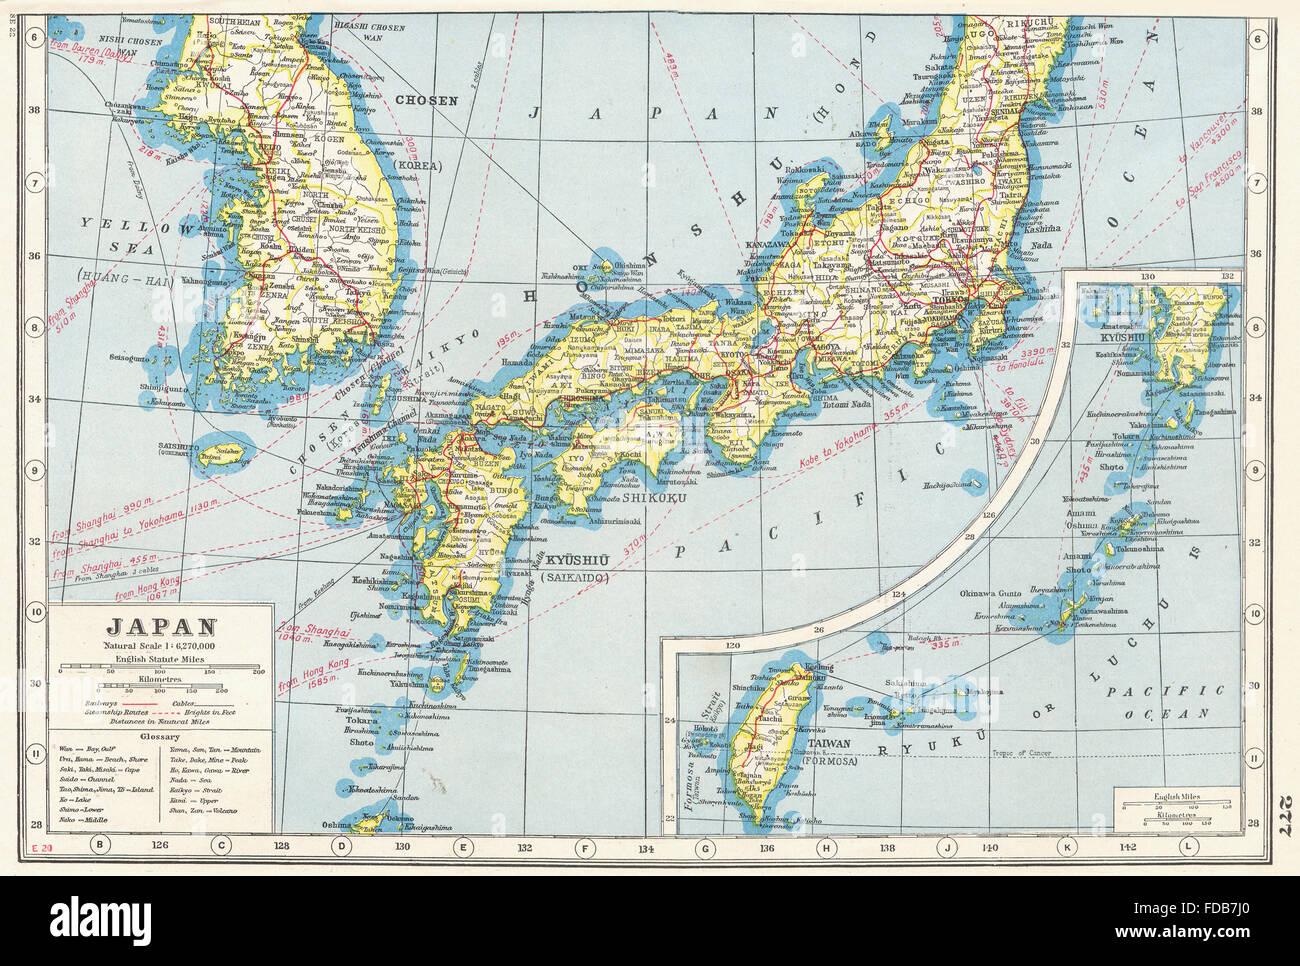 Southern japan korea formosa south korea taiwan railways 1920 southern japan korea formosa south korea taiwan railways 1920 vintage map gumiabroncs Images